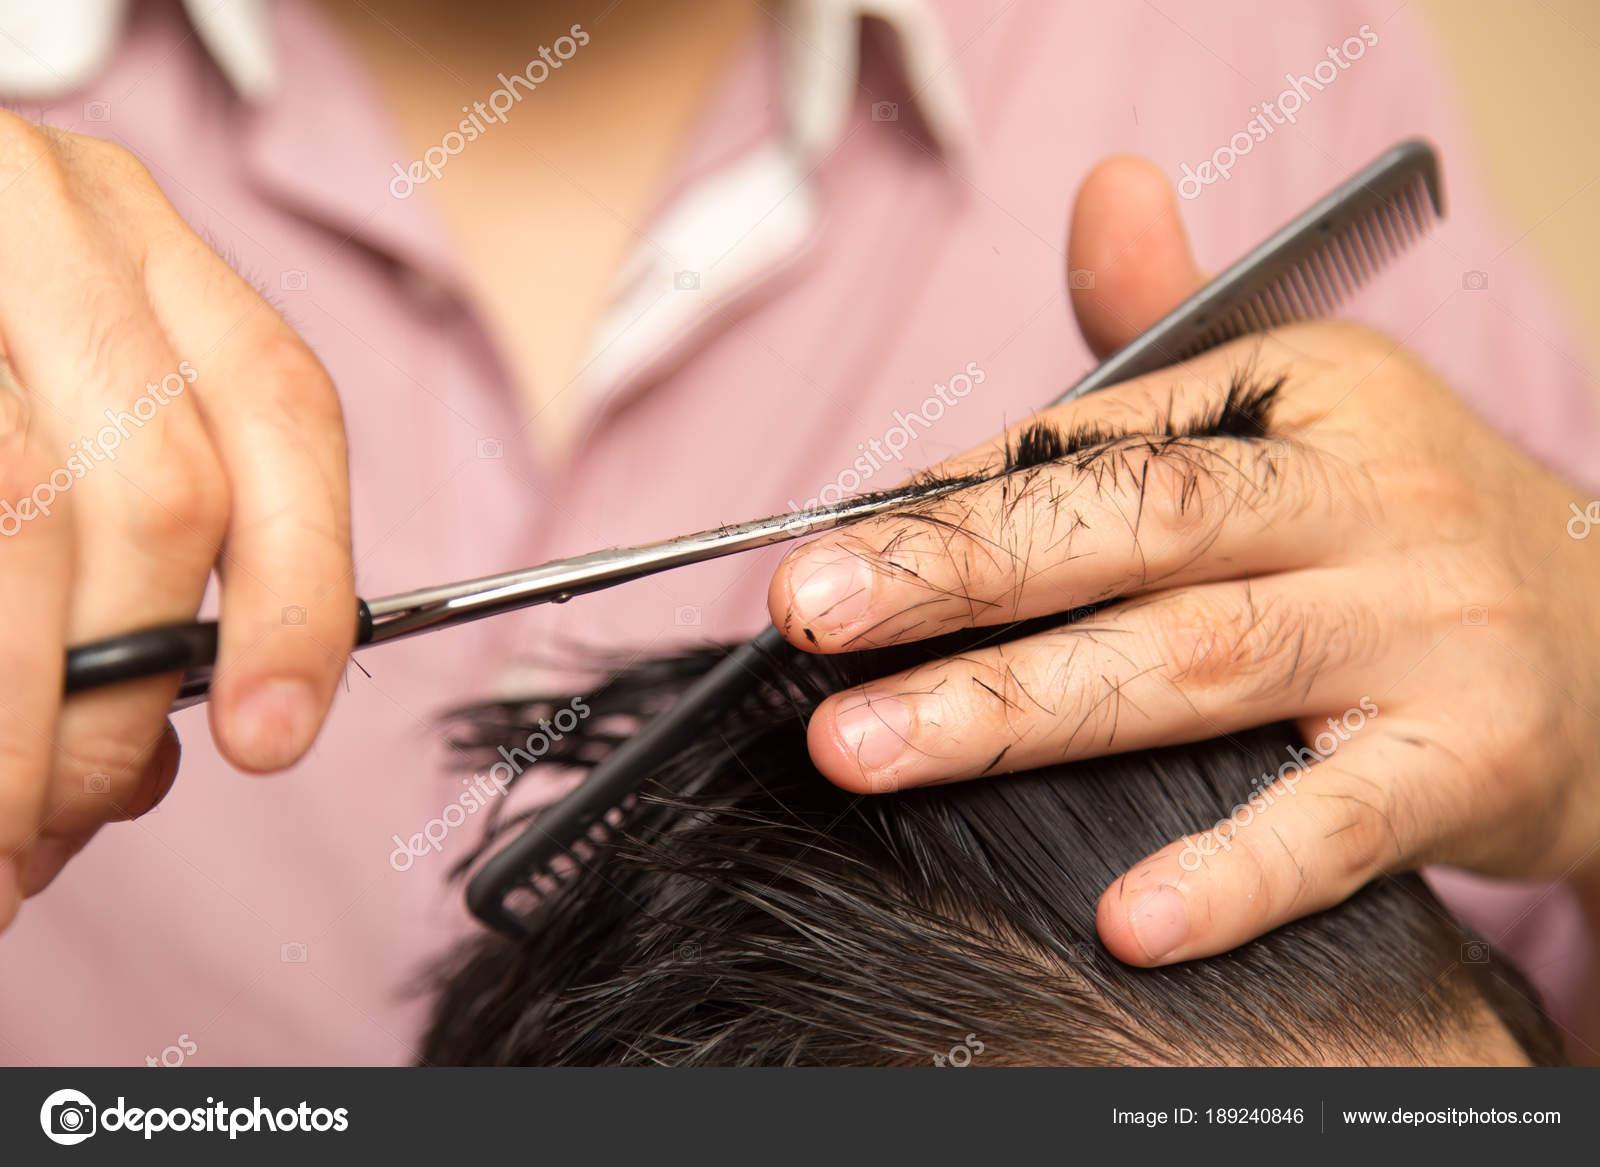 Mens Haircut With Scissors At Salon Stock Photo Schankz 189240846